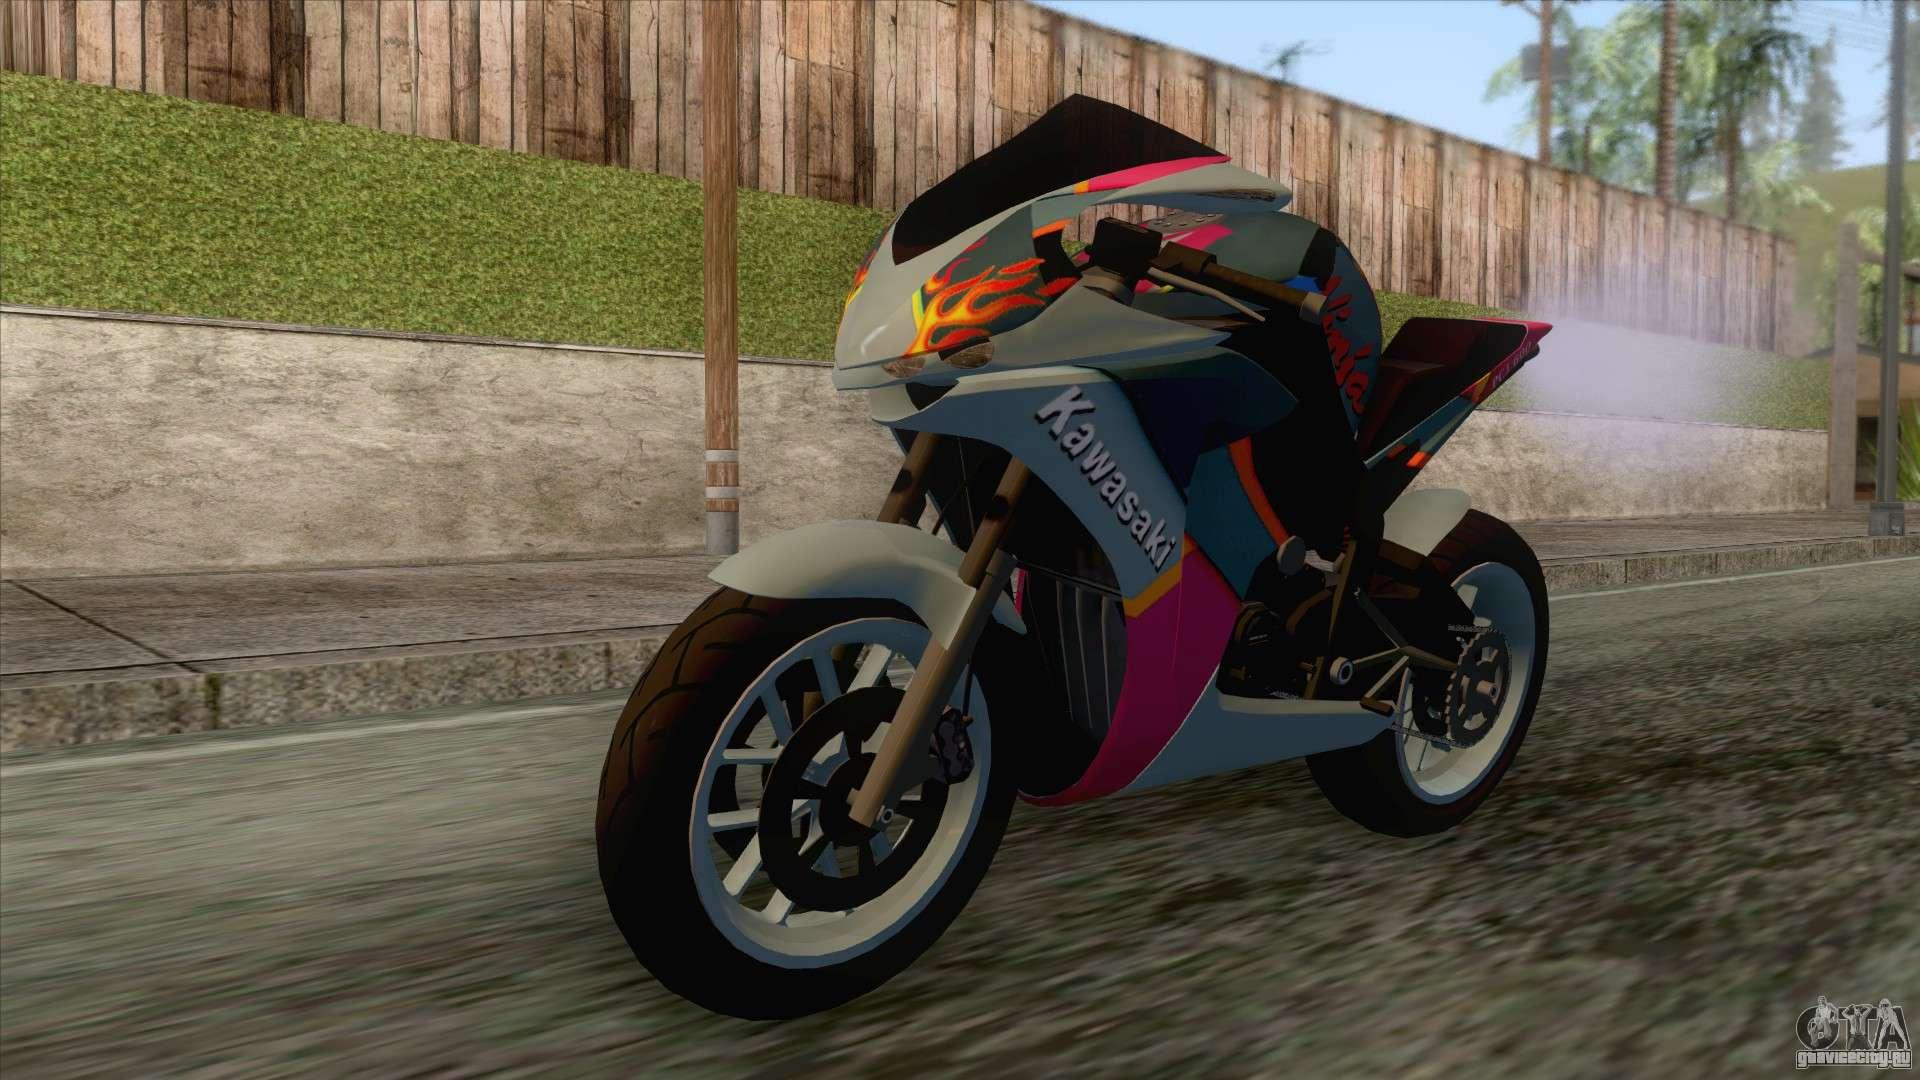 Мотоцентр MEGAACTIVE - продажа квадроциклов от ведущих ...